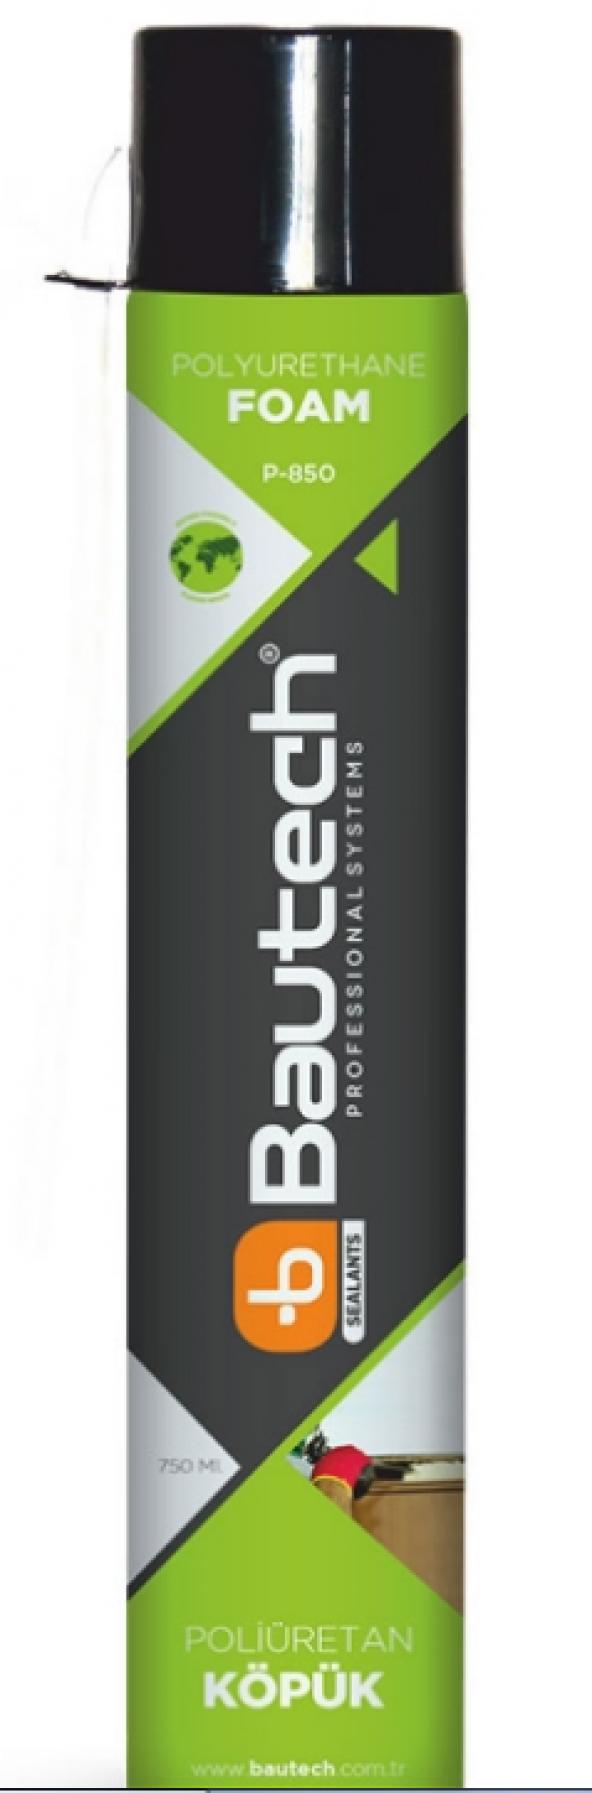 Bautech P-850 Poliüretan Köpük Pipetli 750 ml 850 gr